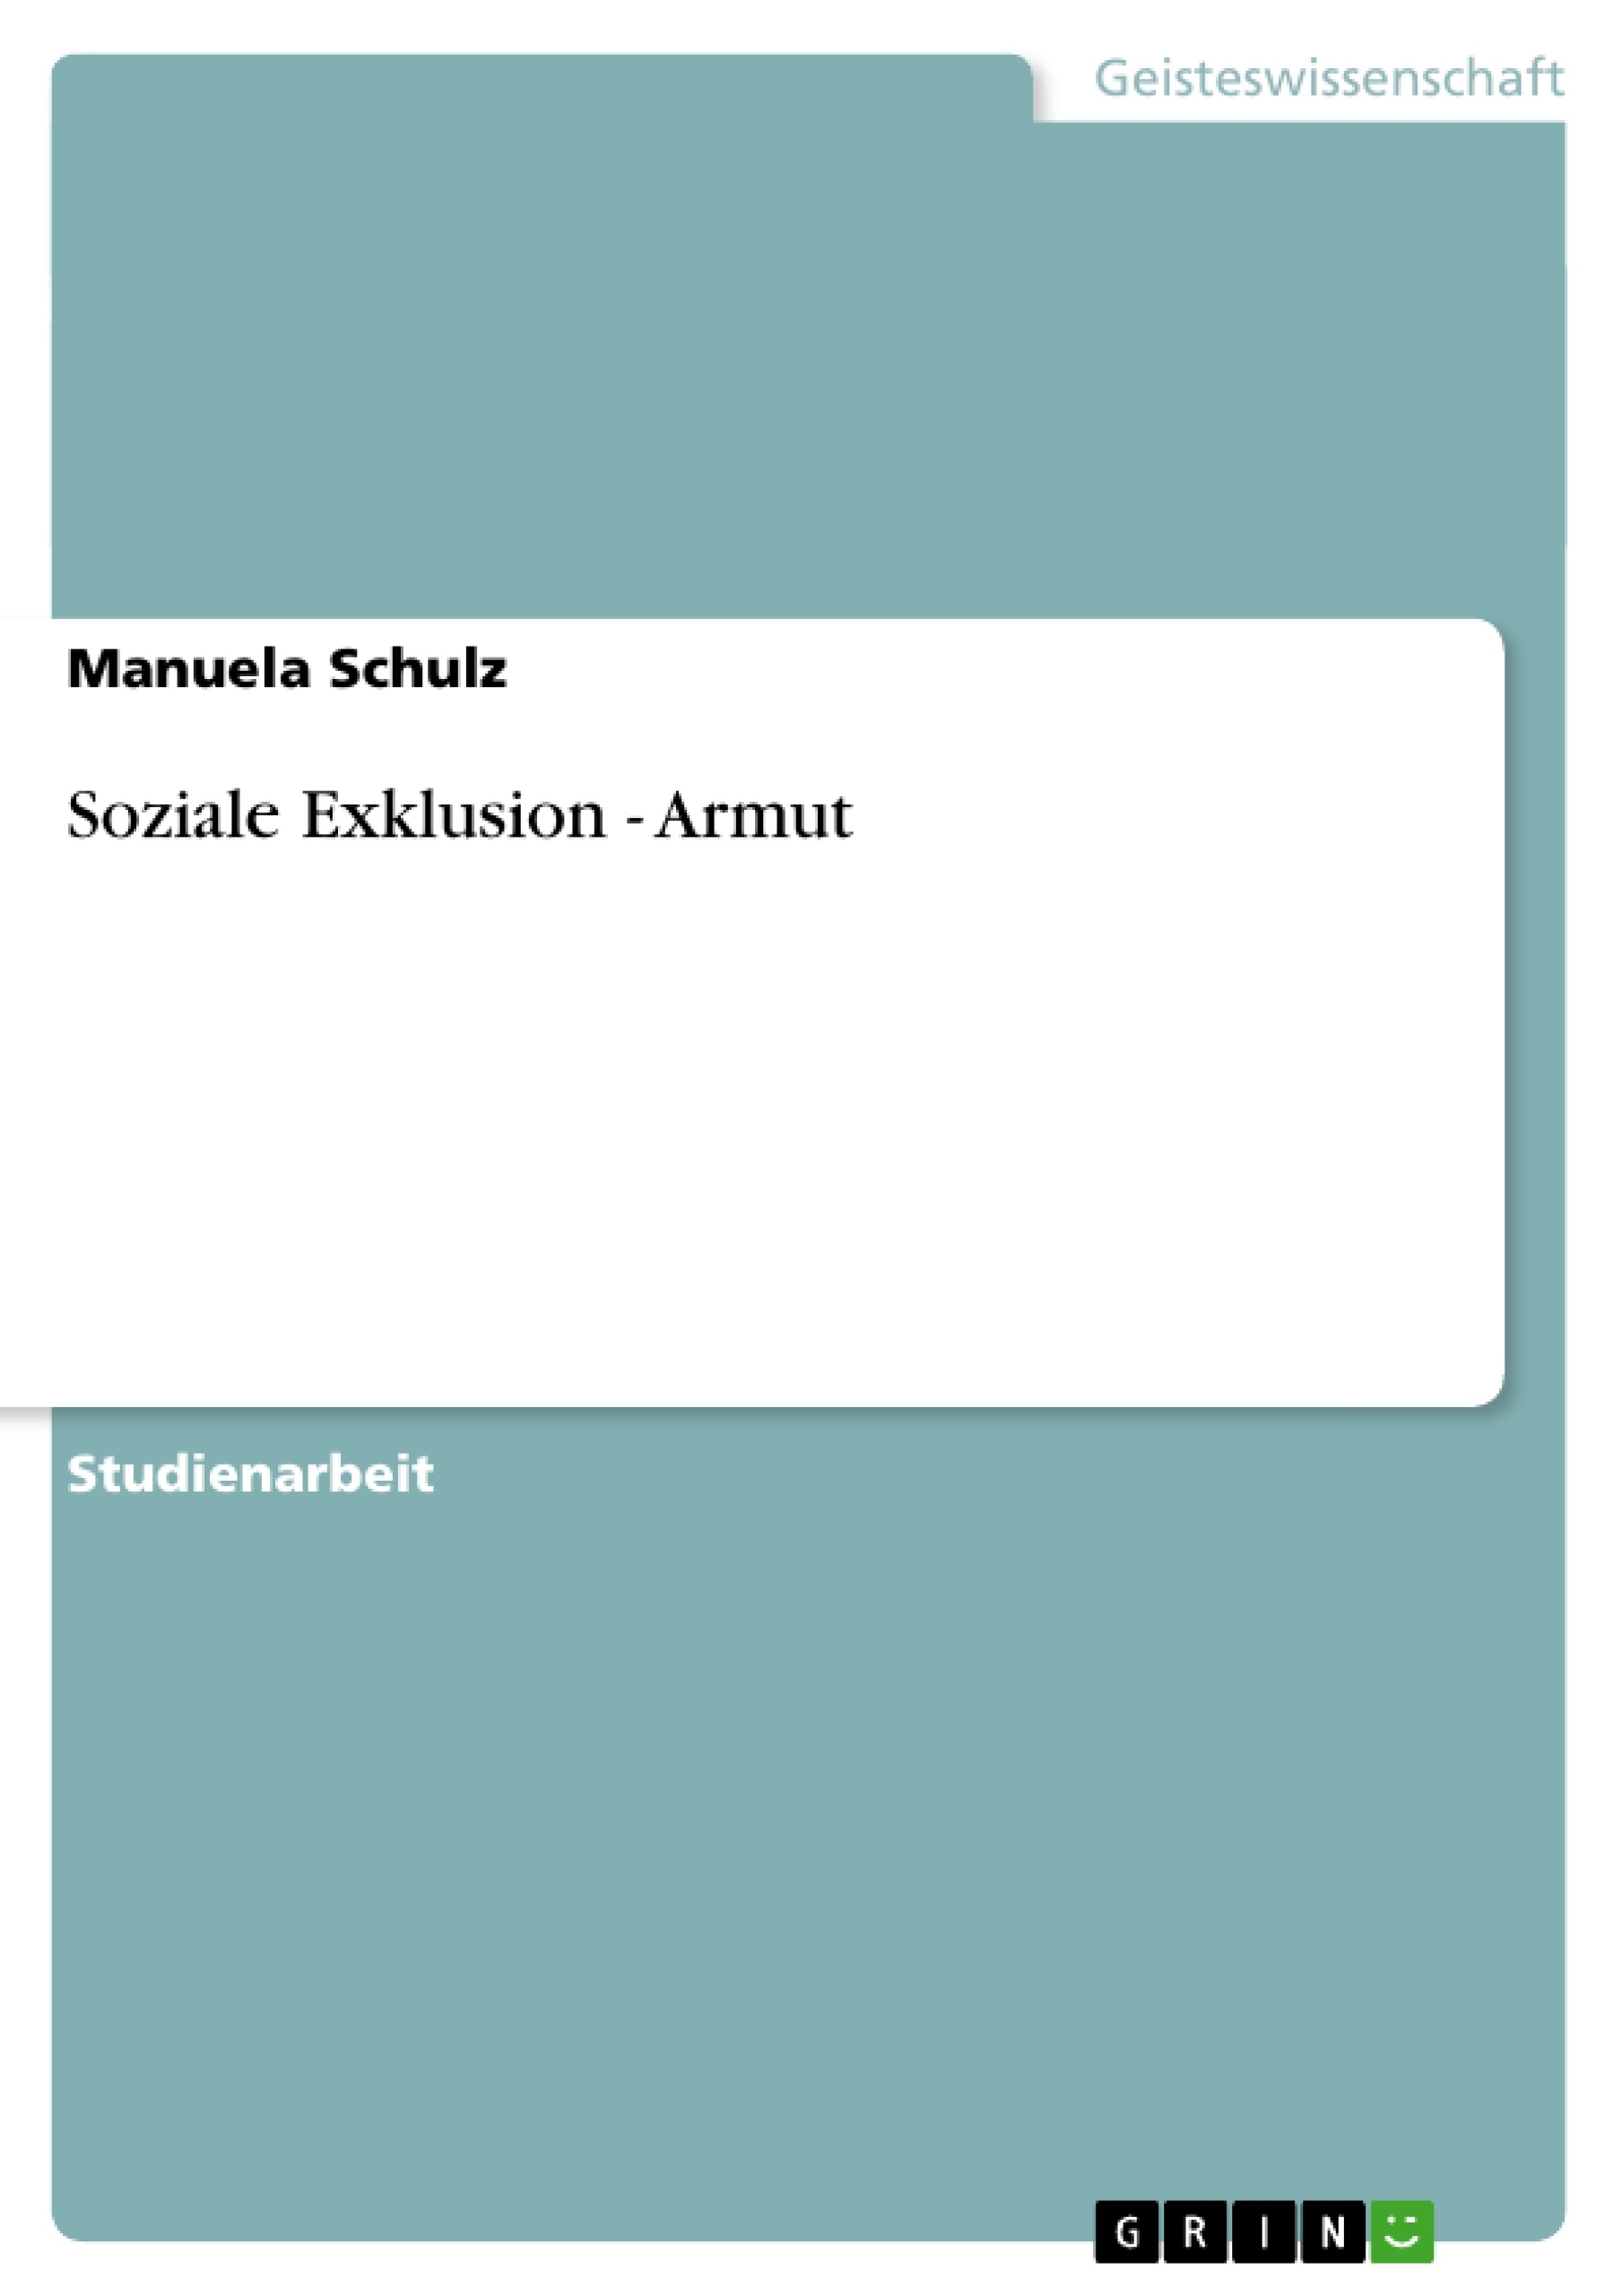 Titel: Soziale Exklusion - Armut